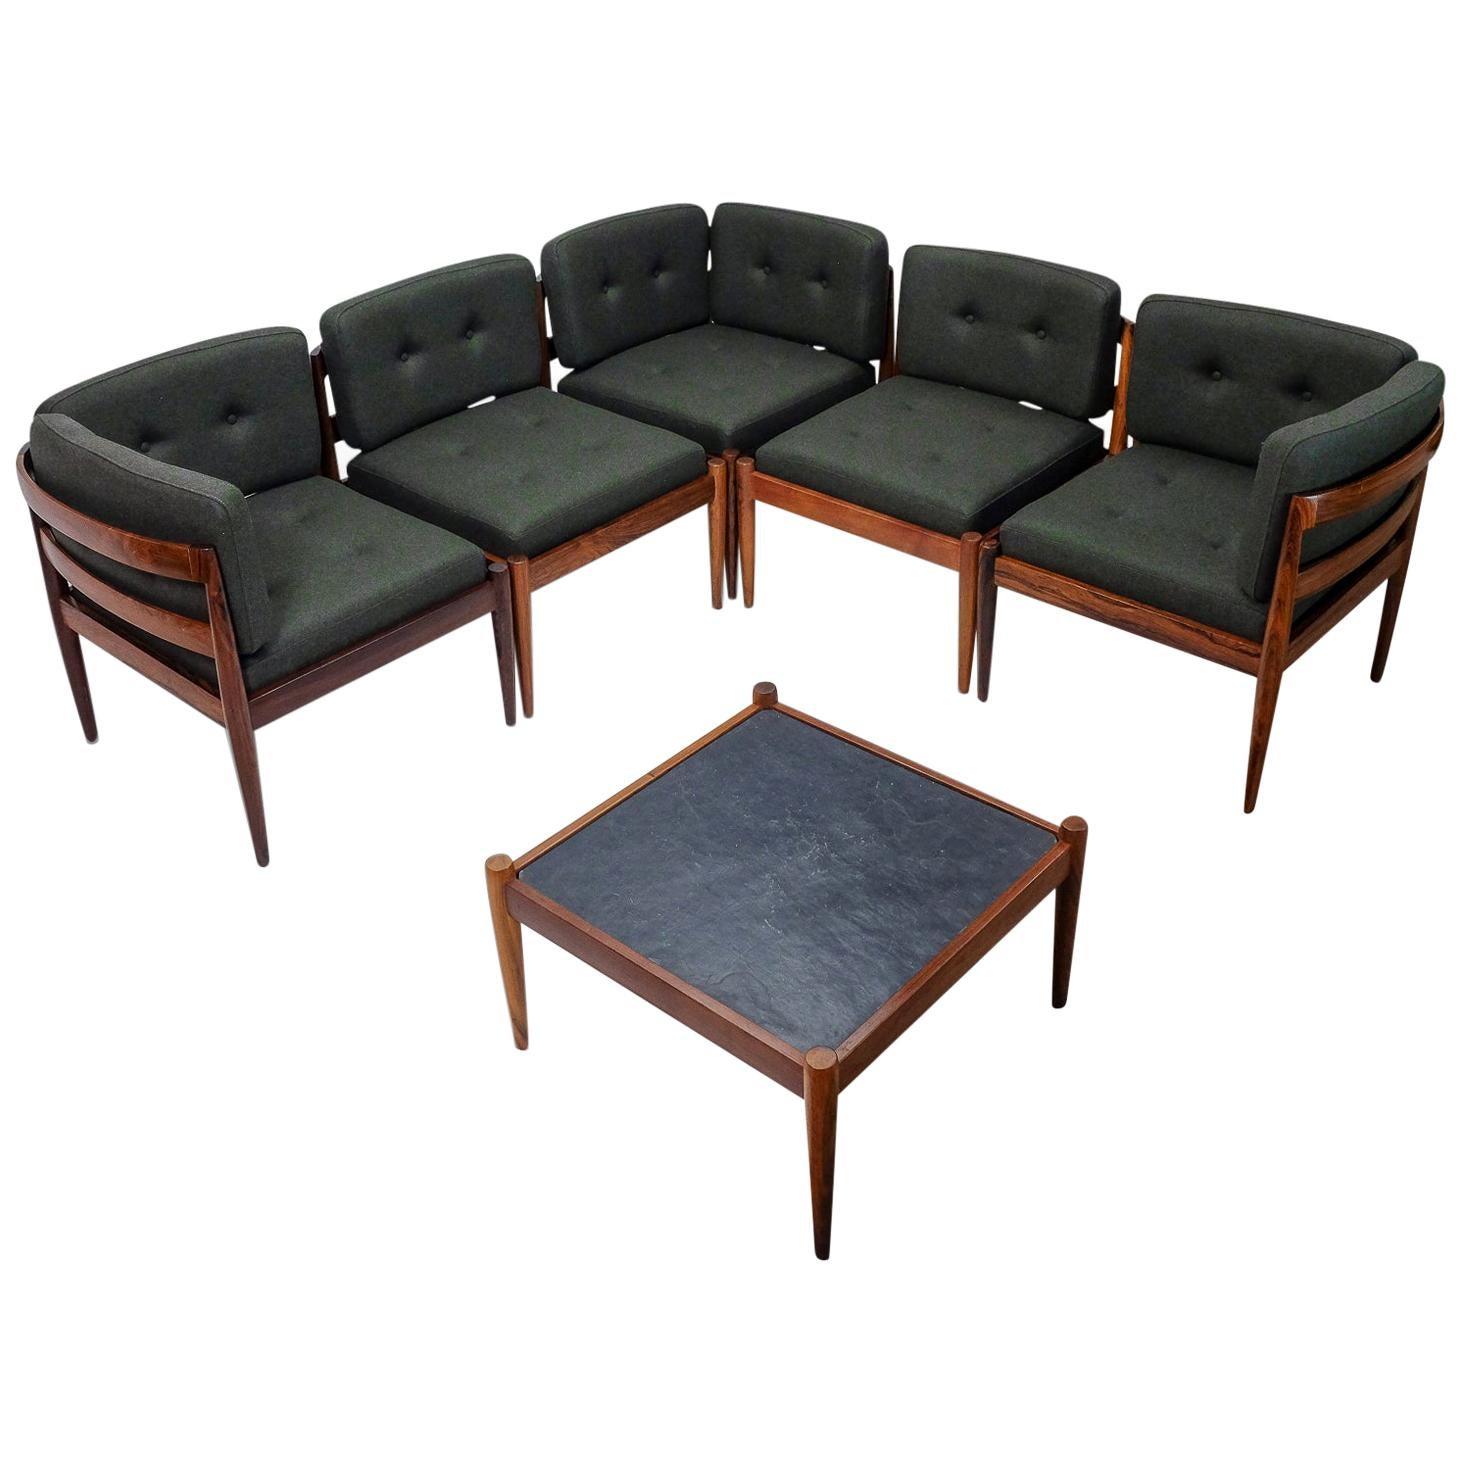 Danish Design Kai Kristiansen Seating Group Model Universe, 1960s